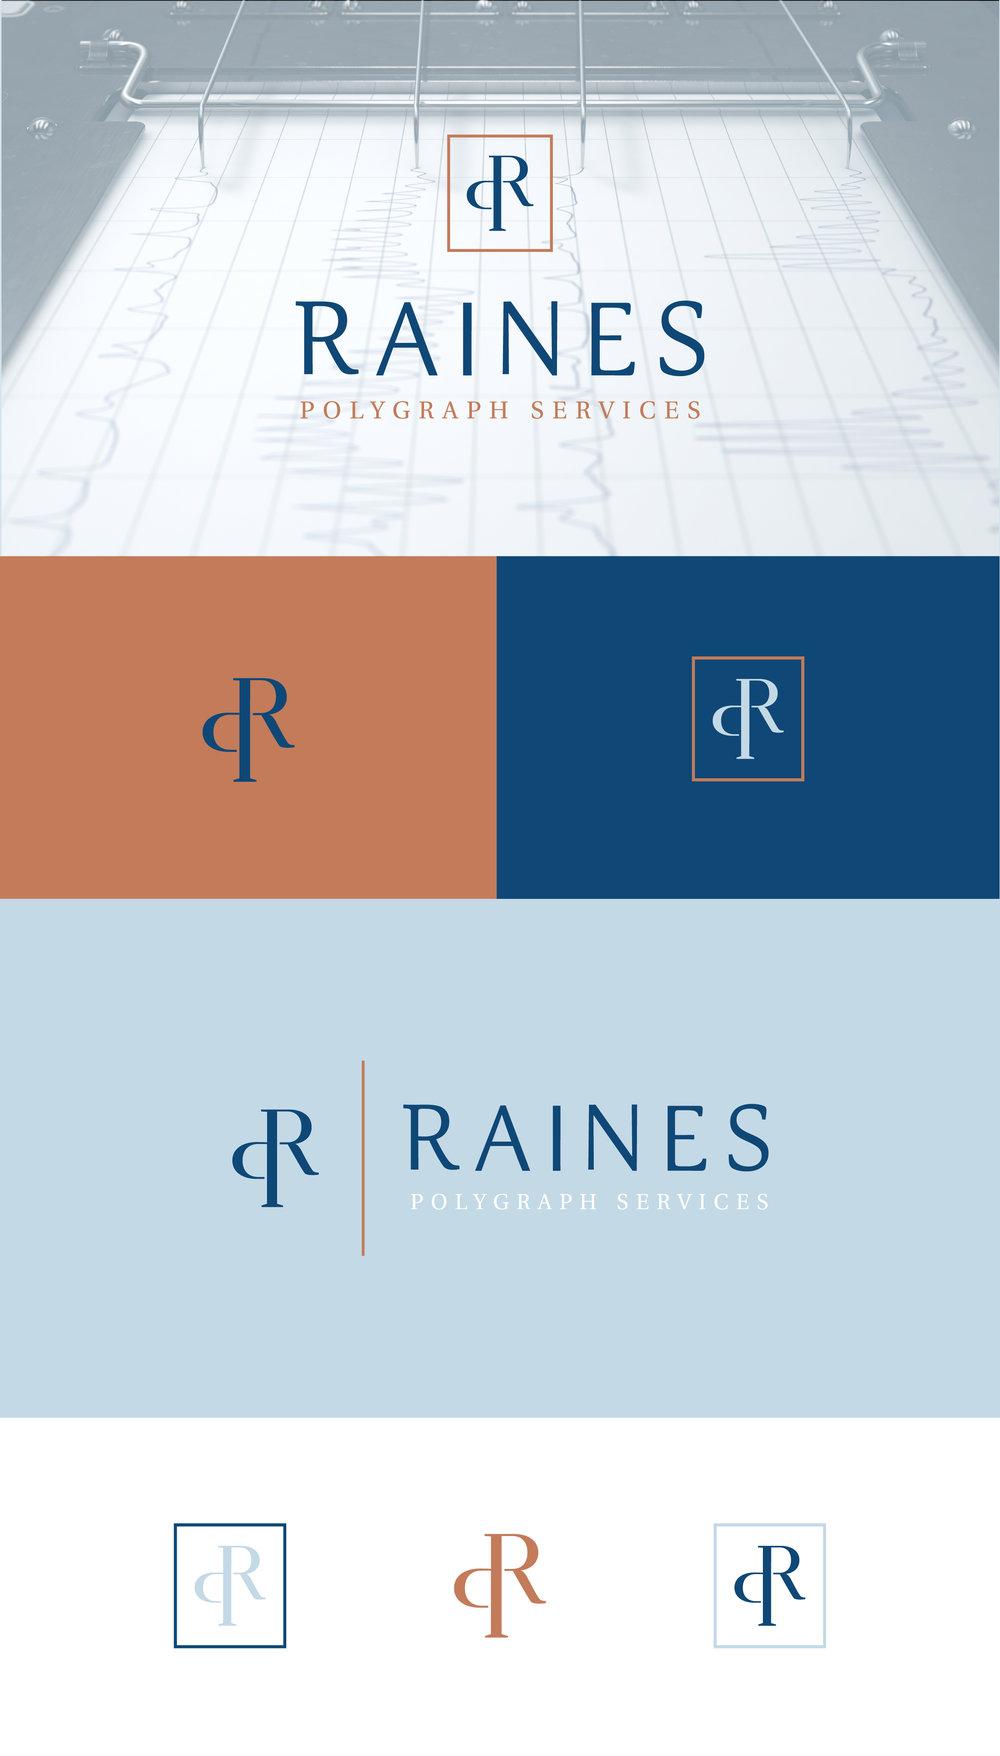 Raines Polygraph Services - logo design - tulsa brand designer - Hayley Bigham Designs